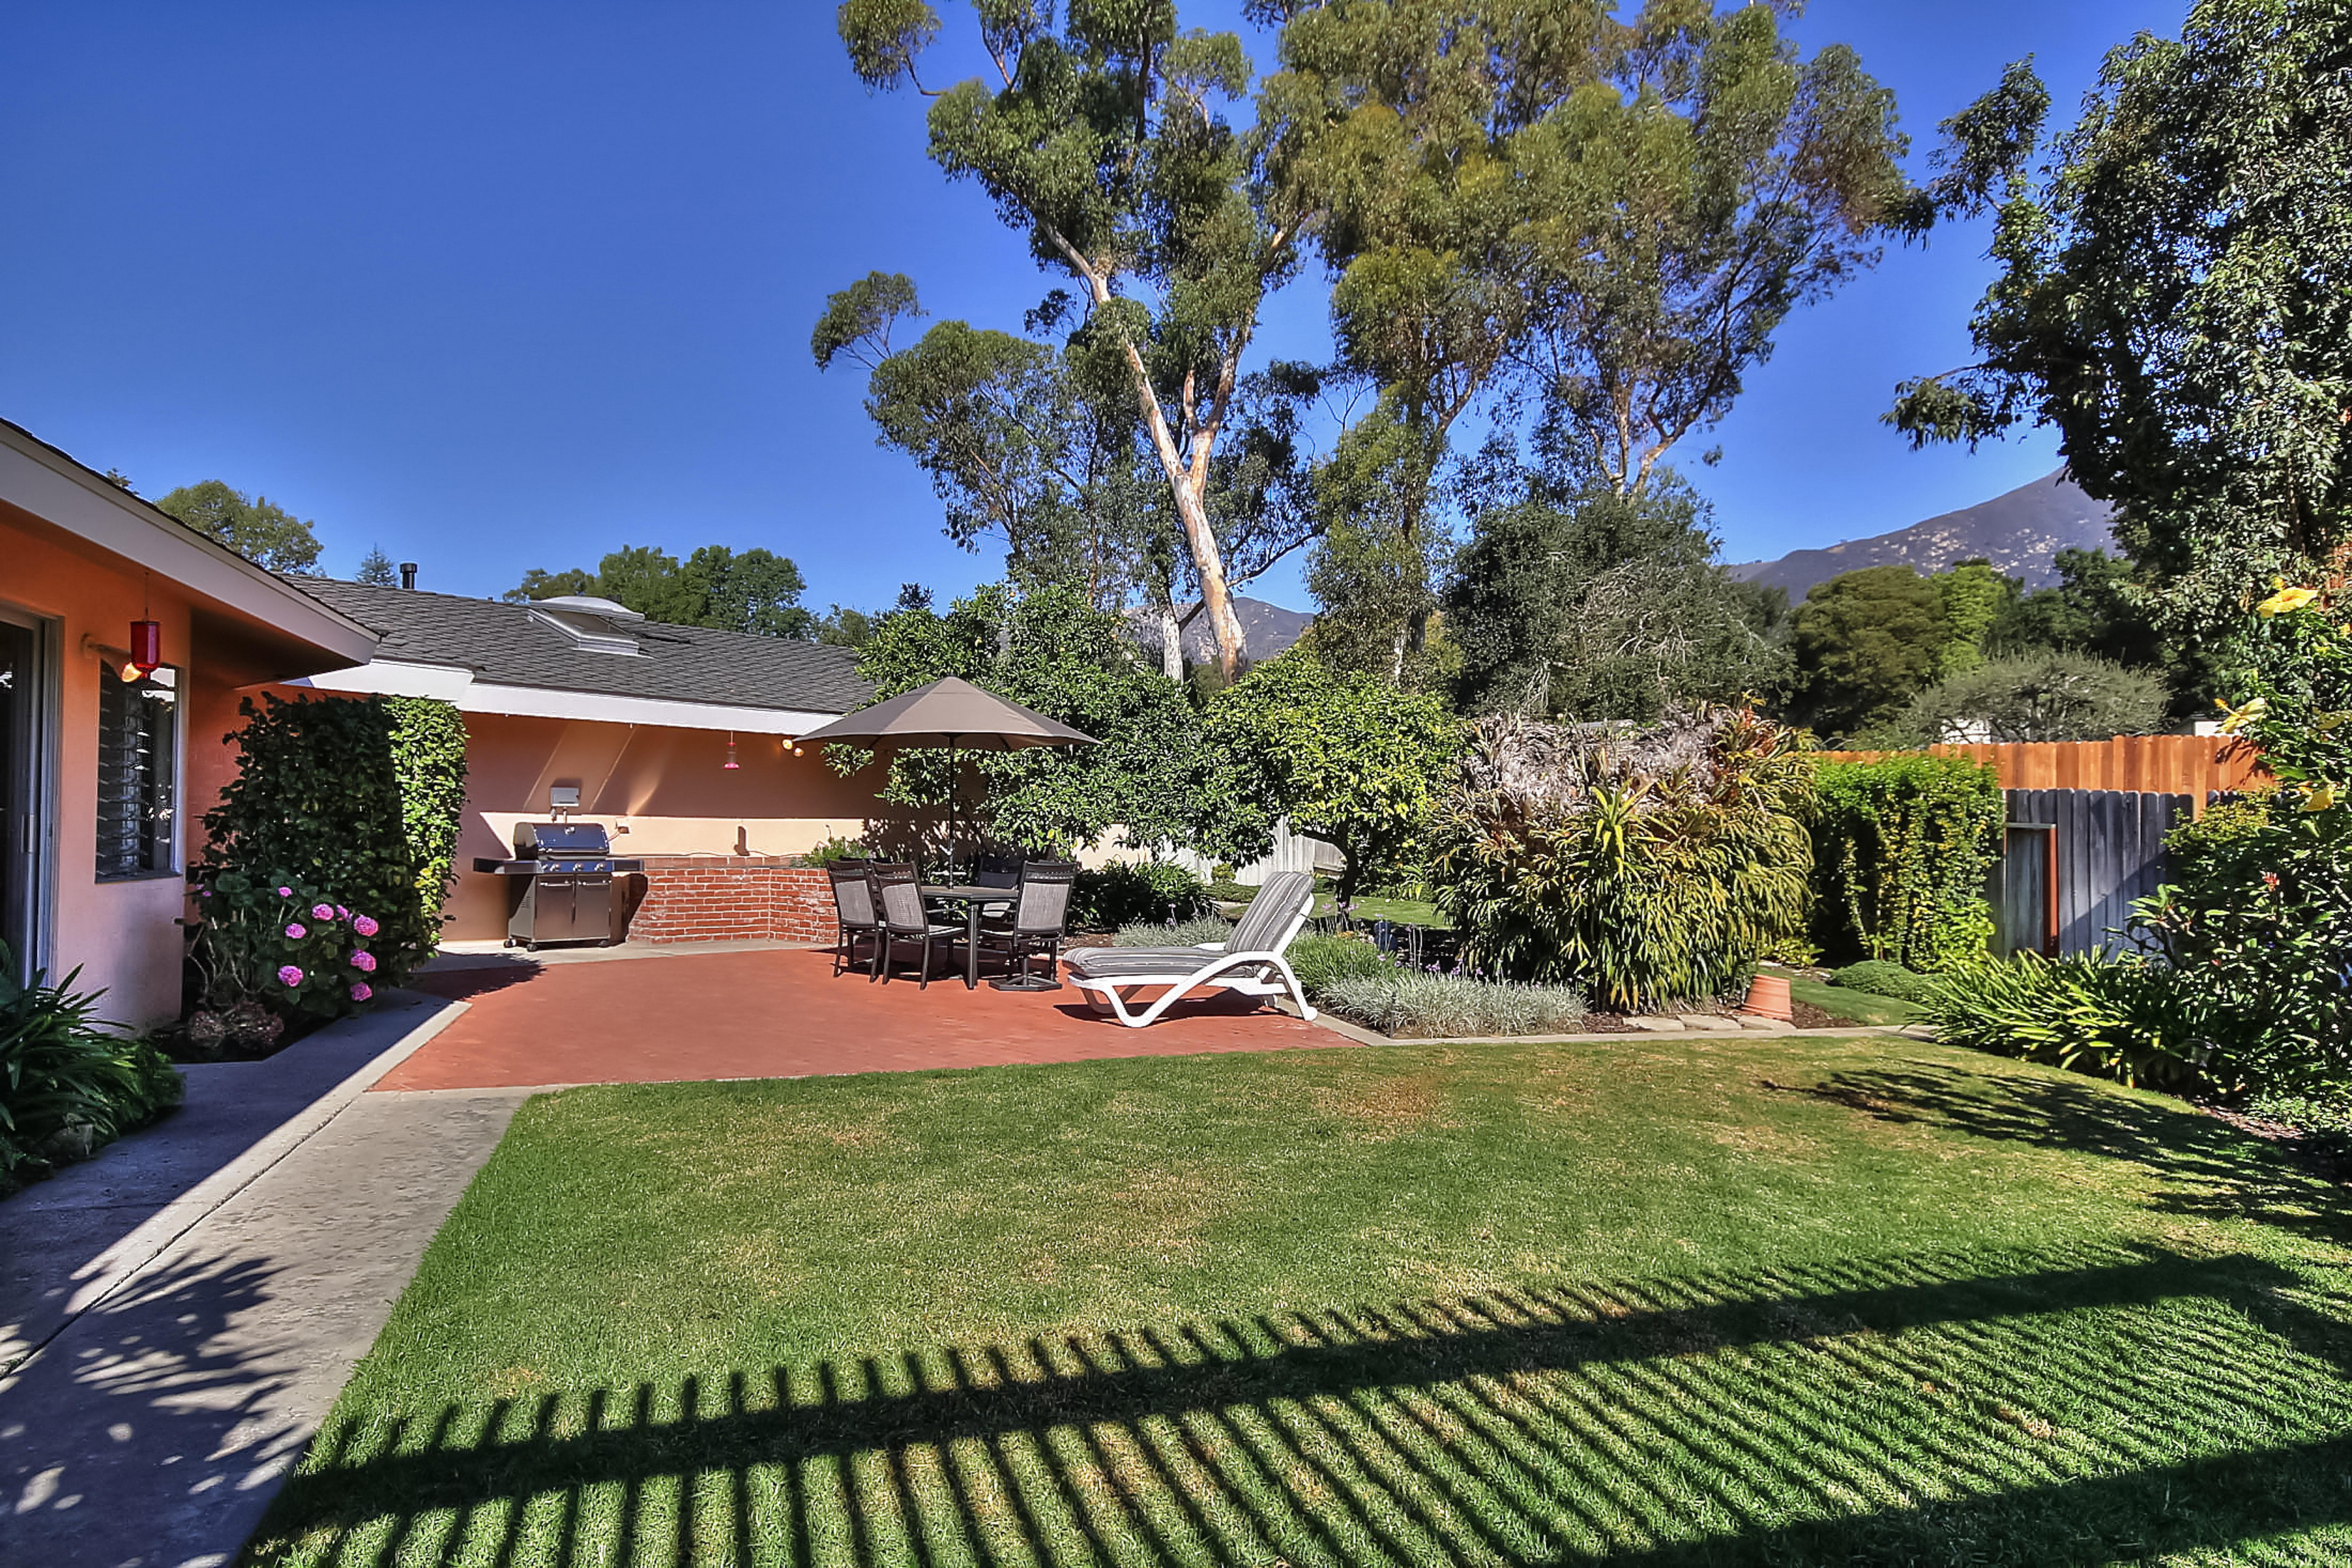 Montecito CA Vacation Rental Welcome to Montecito!